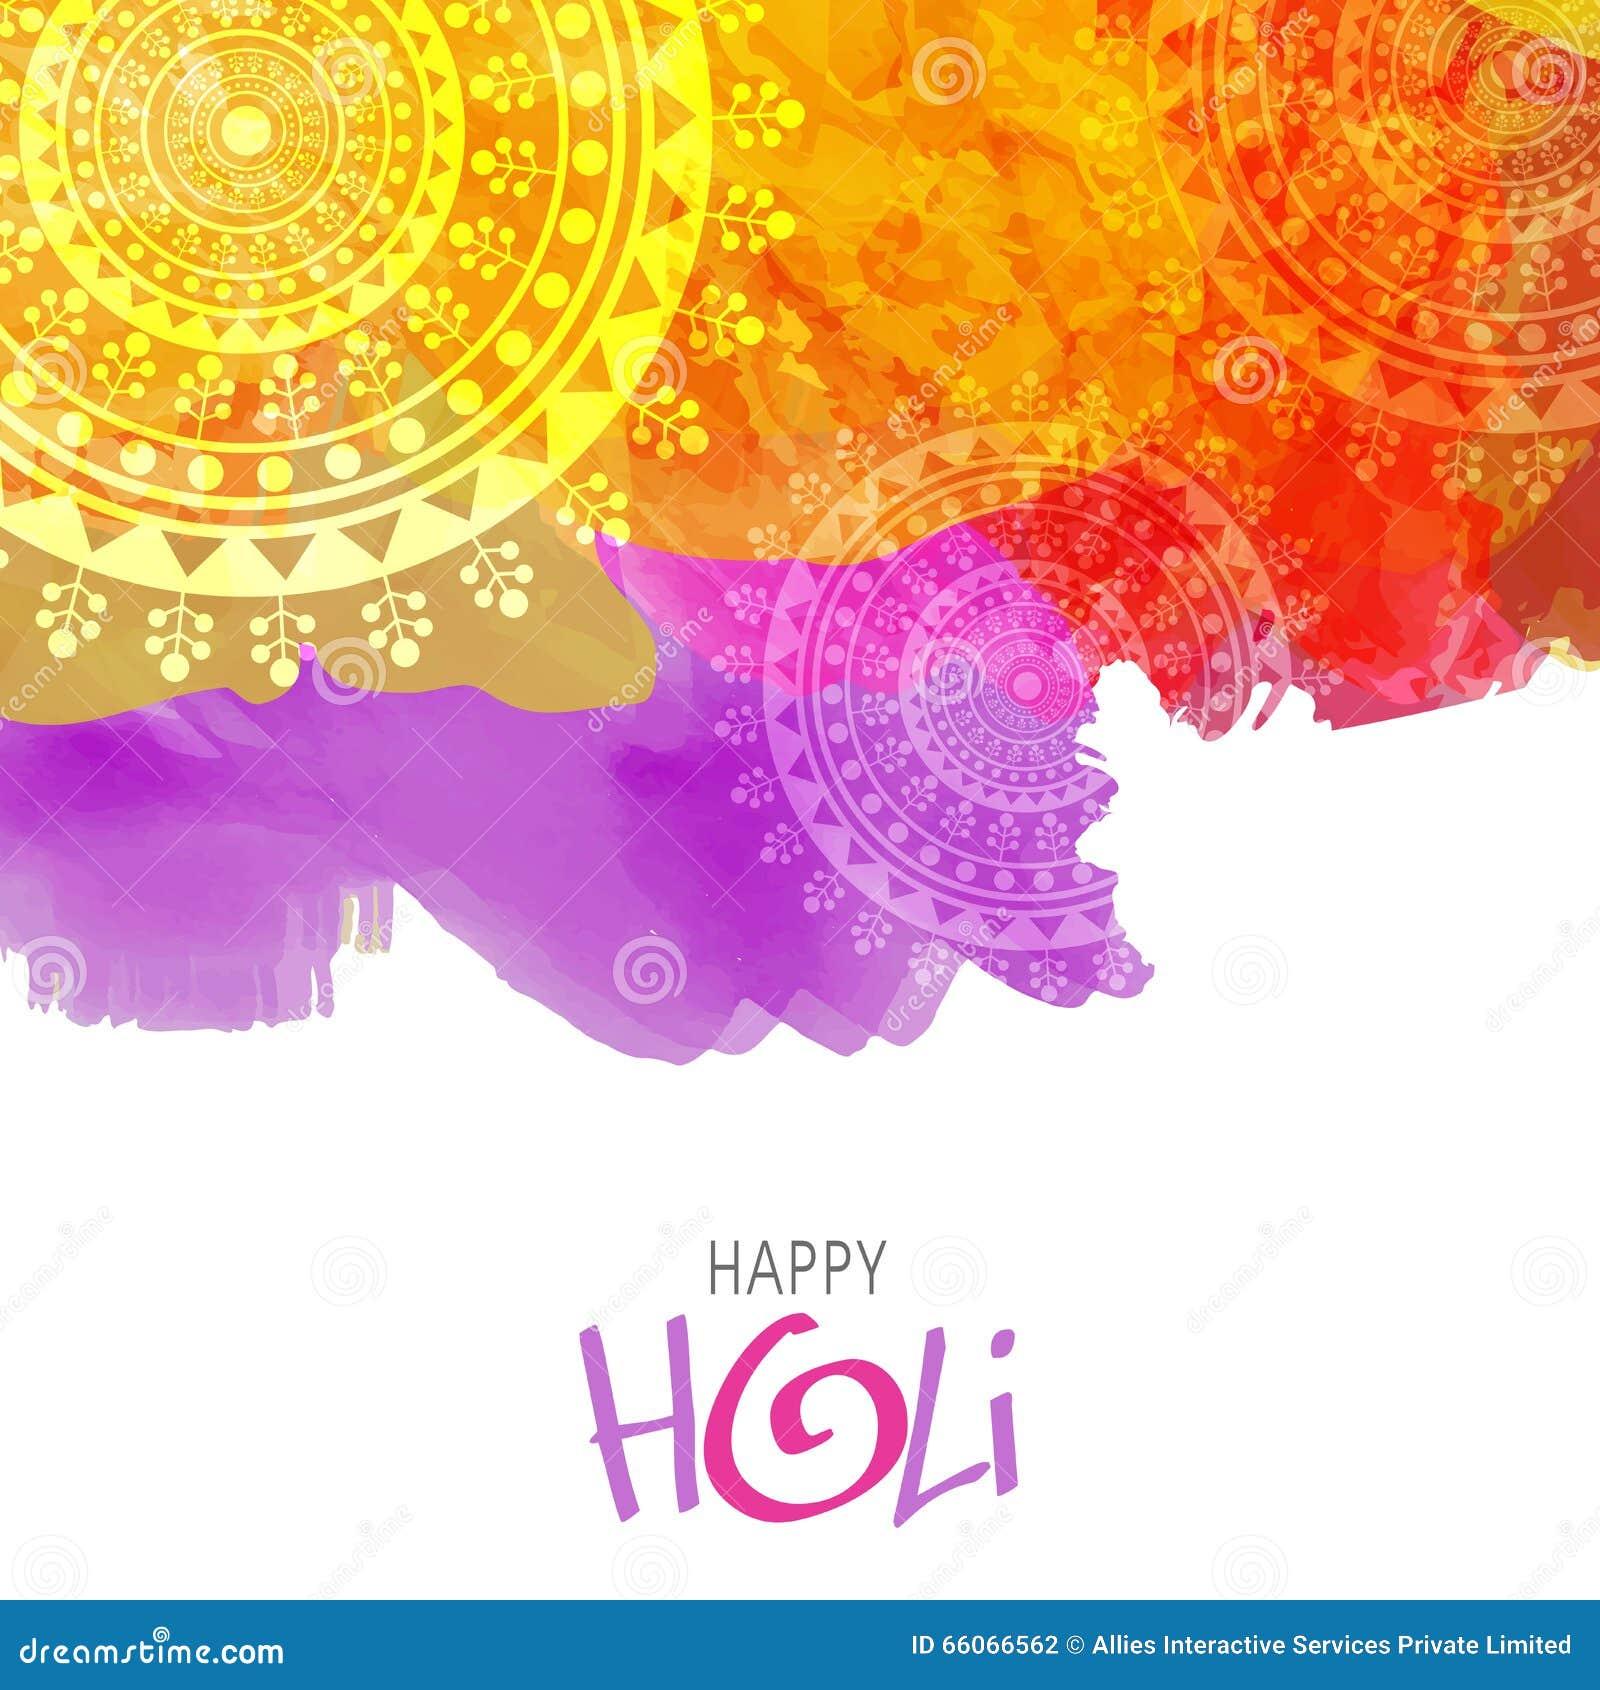 creative background for holi festival celebration stock